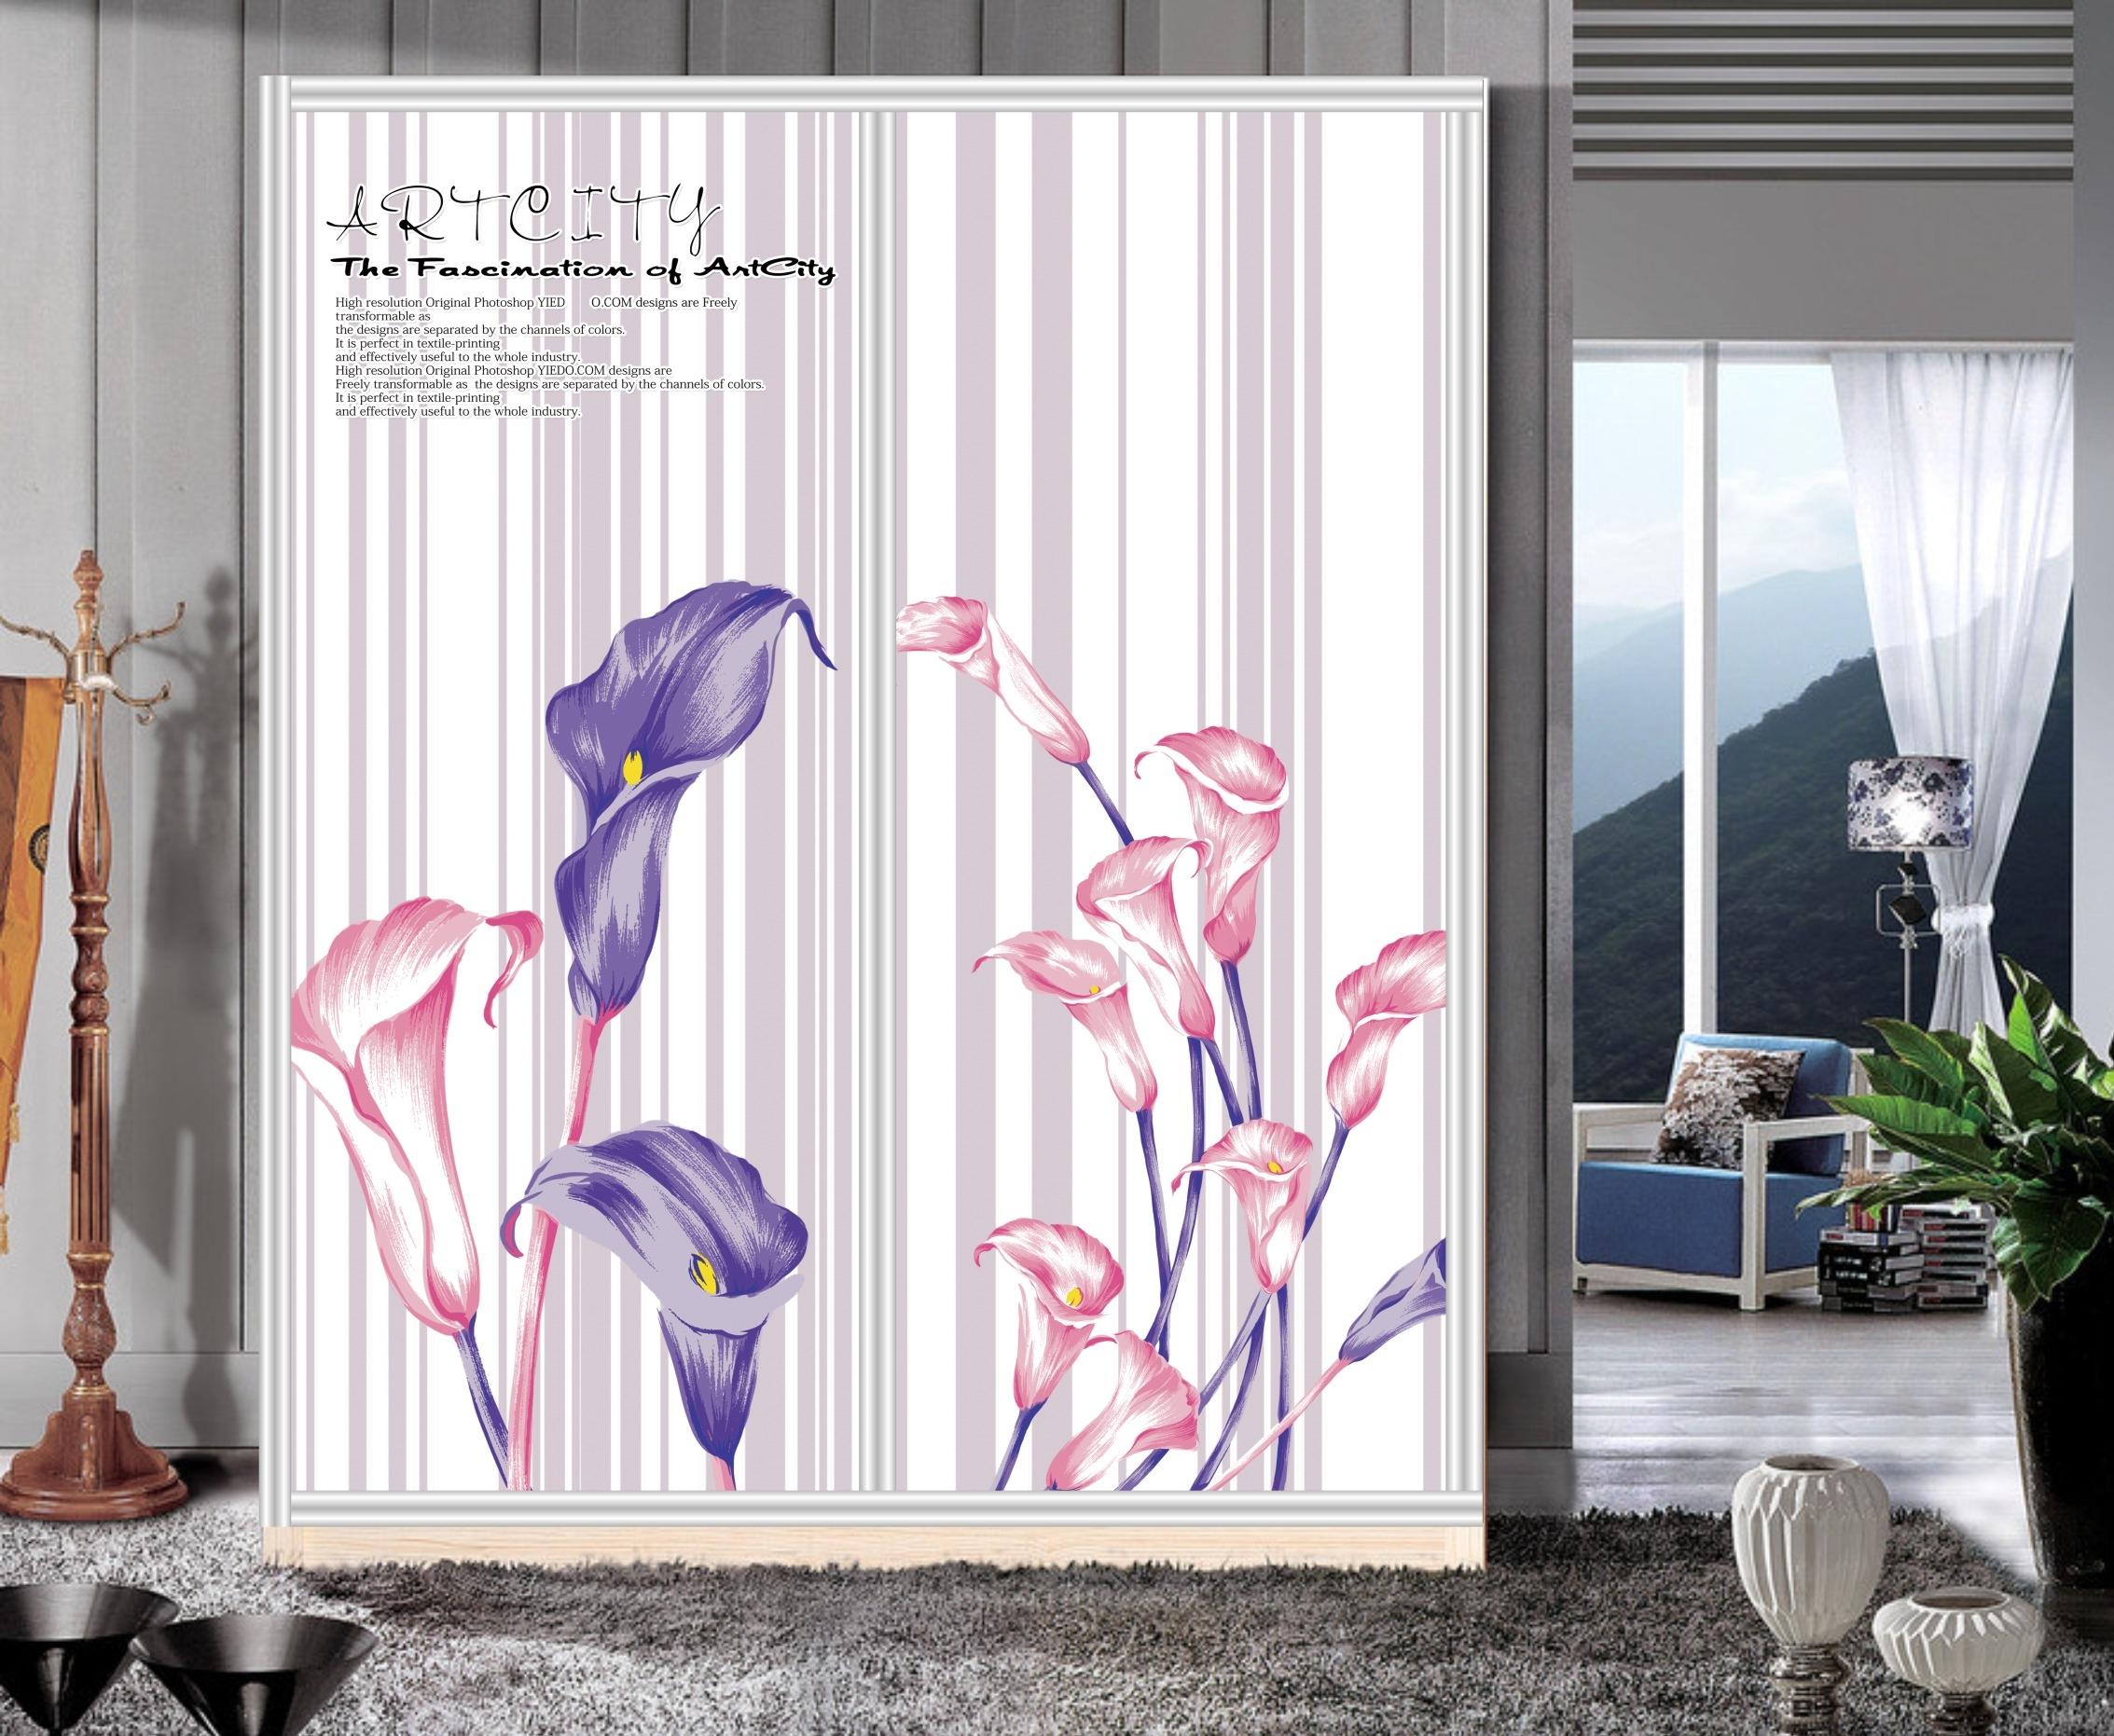 image patio sliding door design glass x decal stickers uk ideas inspirational decorative elegant with of for full measurements doors decals